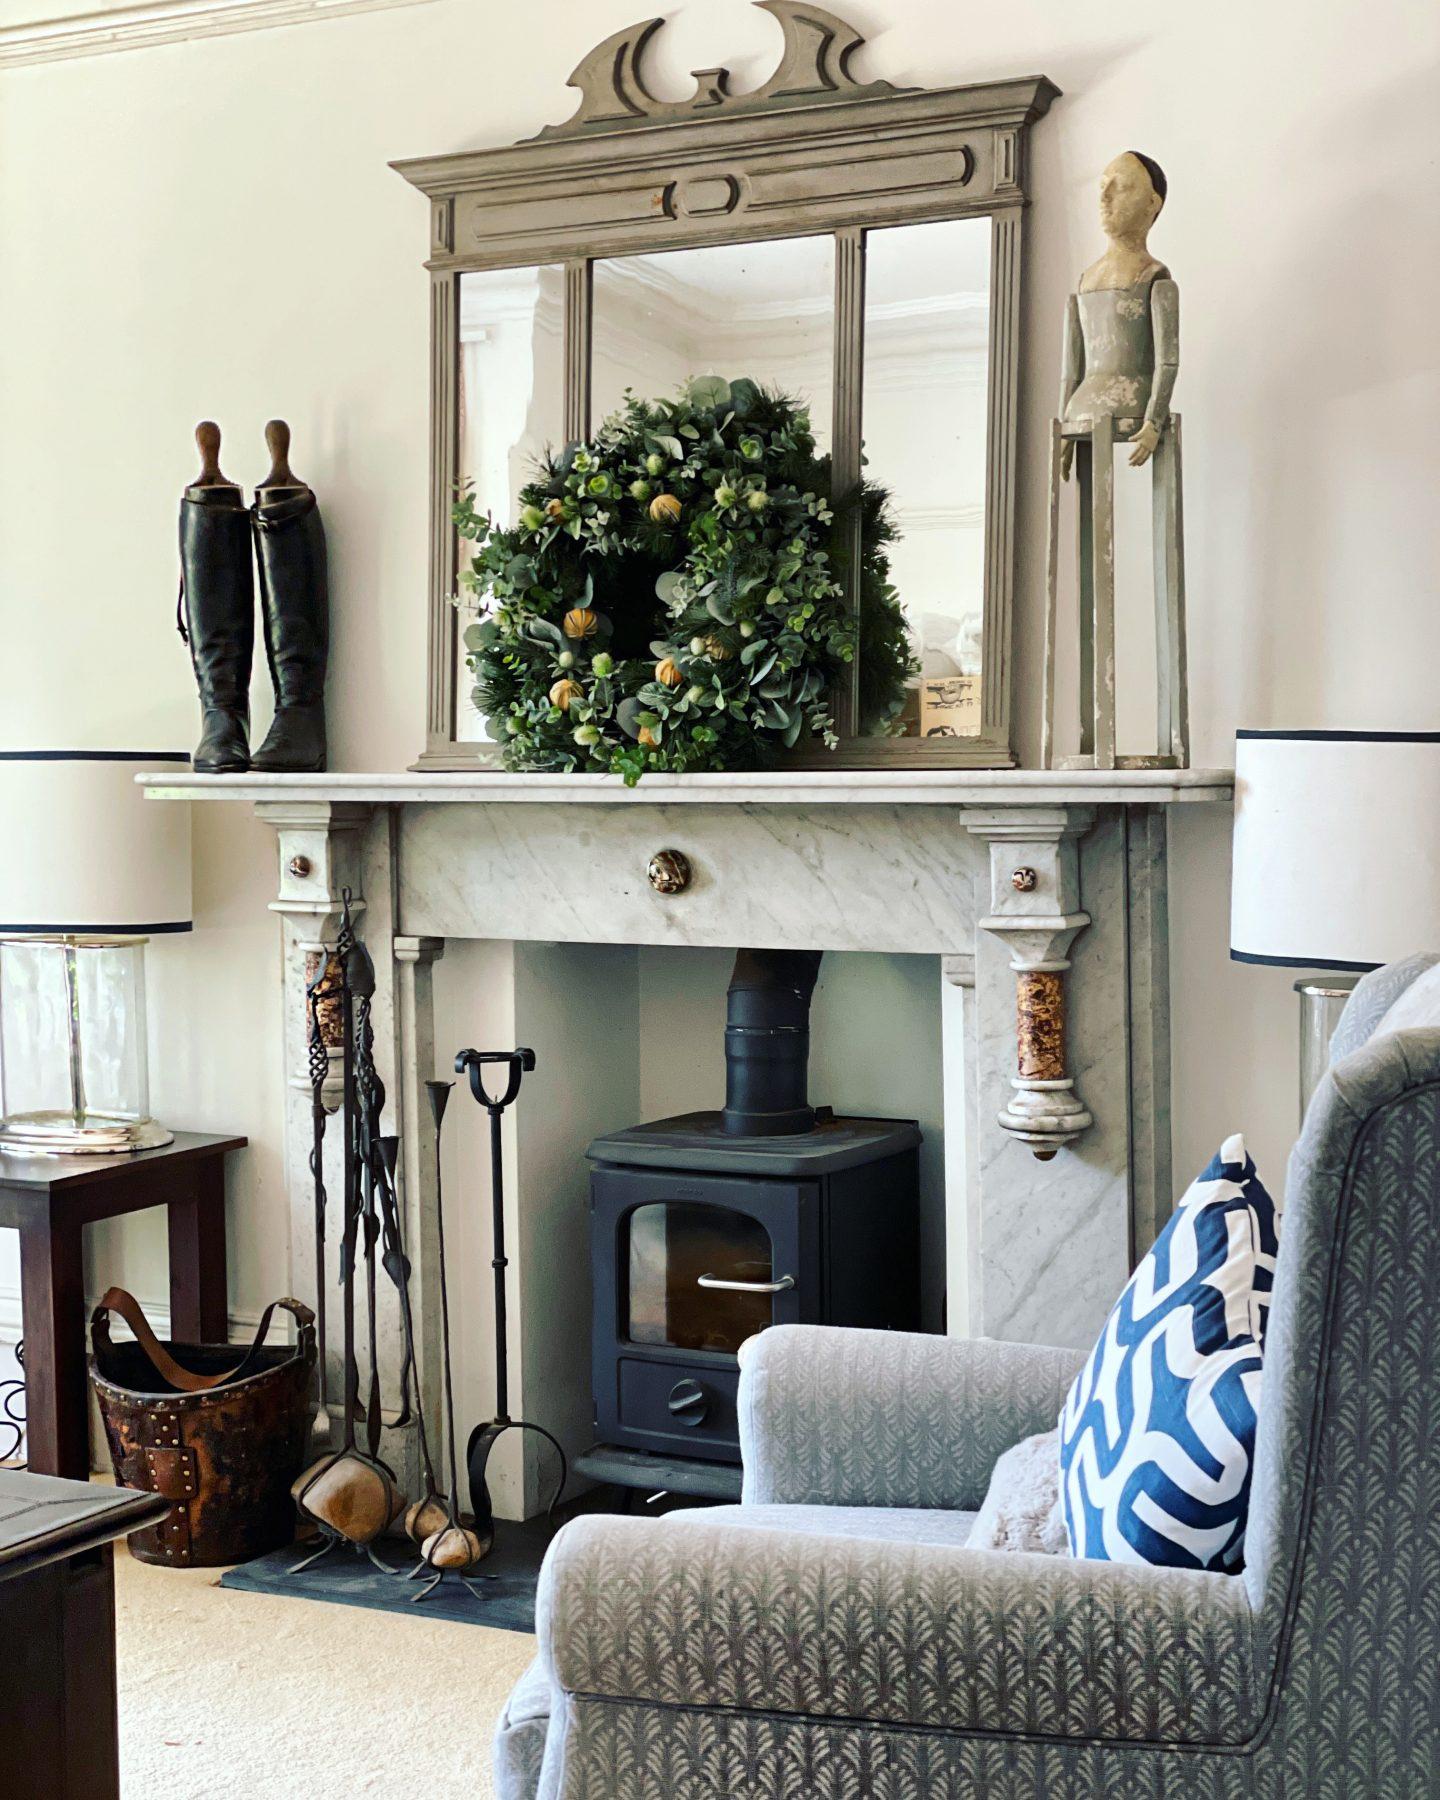 Victorian gothic semi detached house - the living room. Owned by Jp Clark @jpslifeandloves jpslifeandloves.com